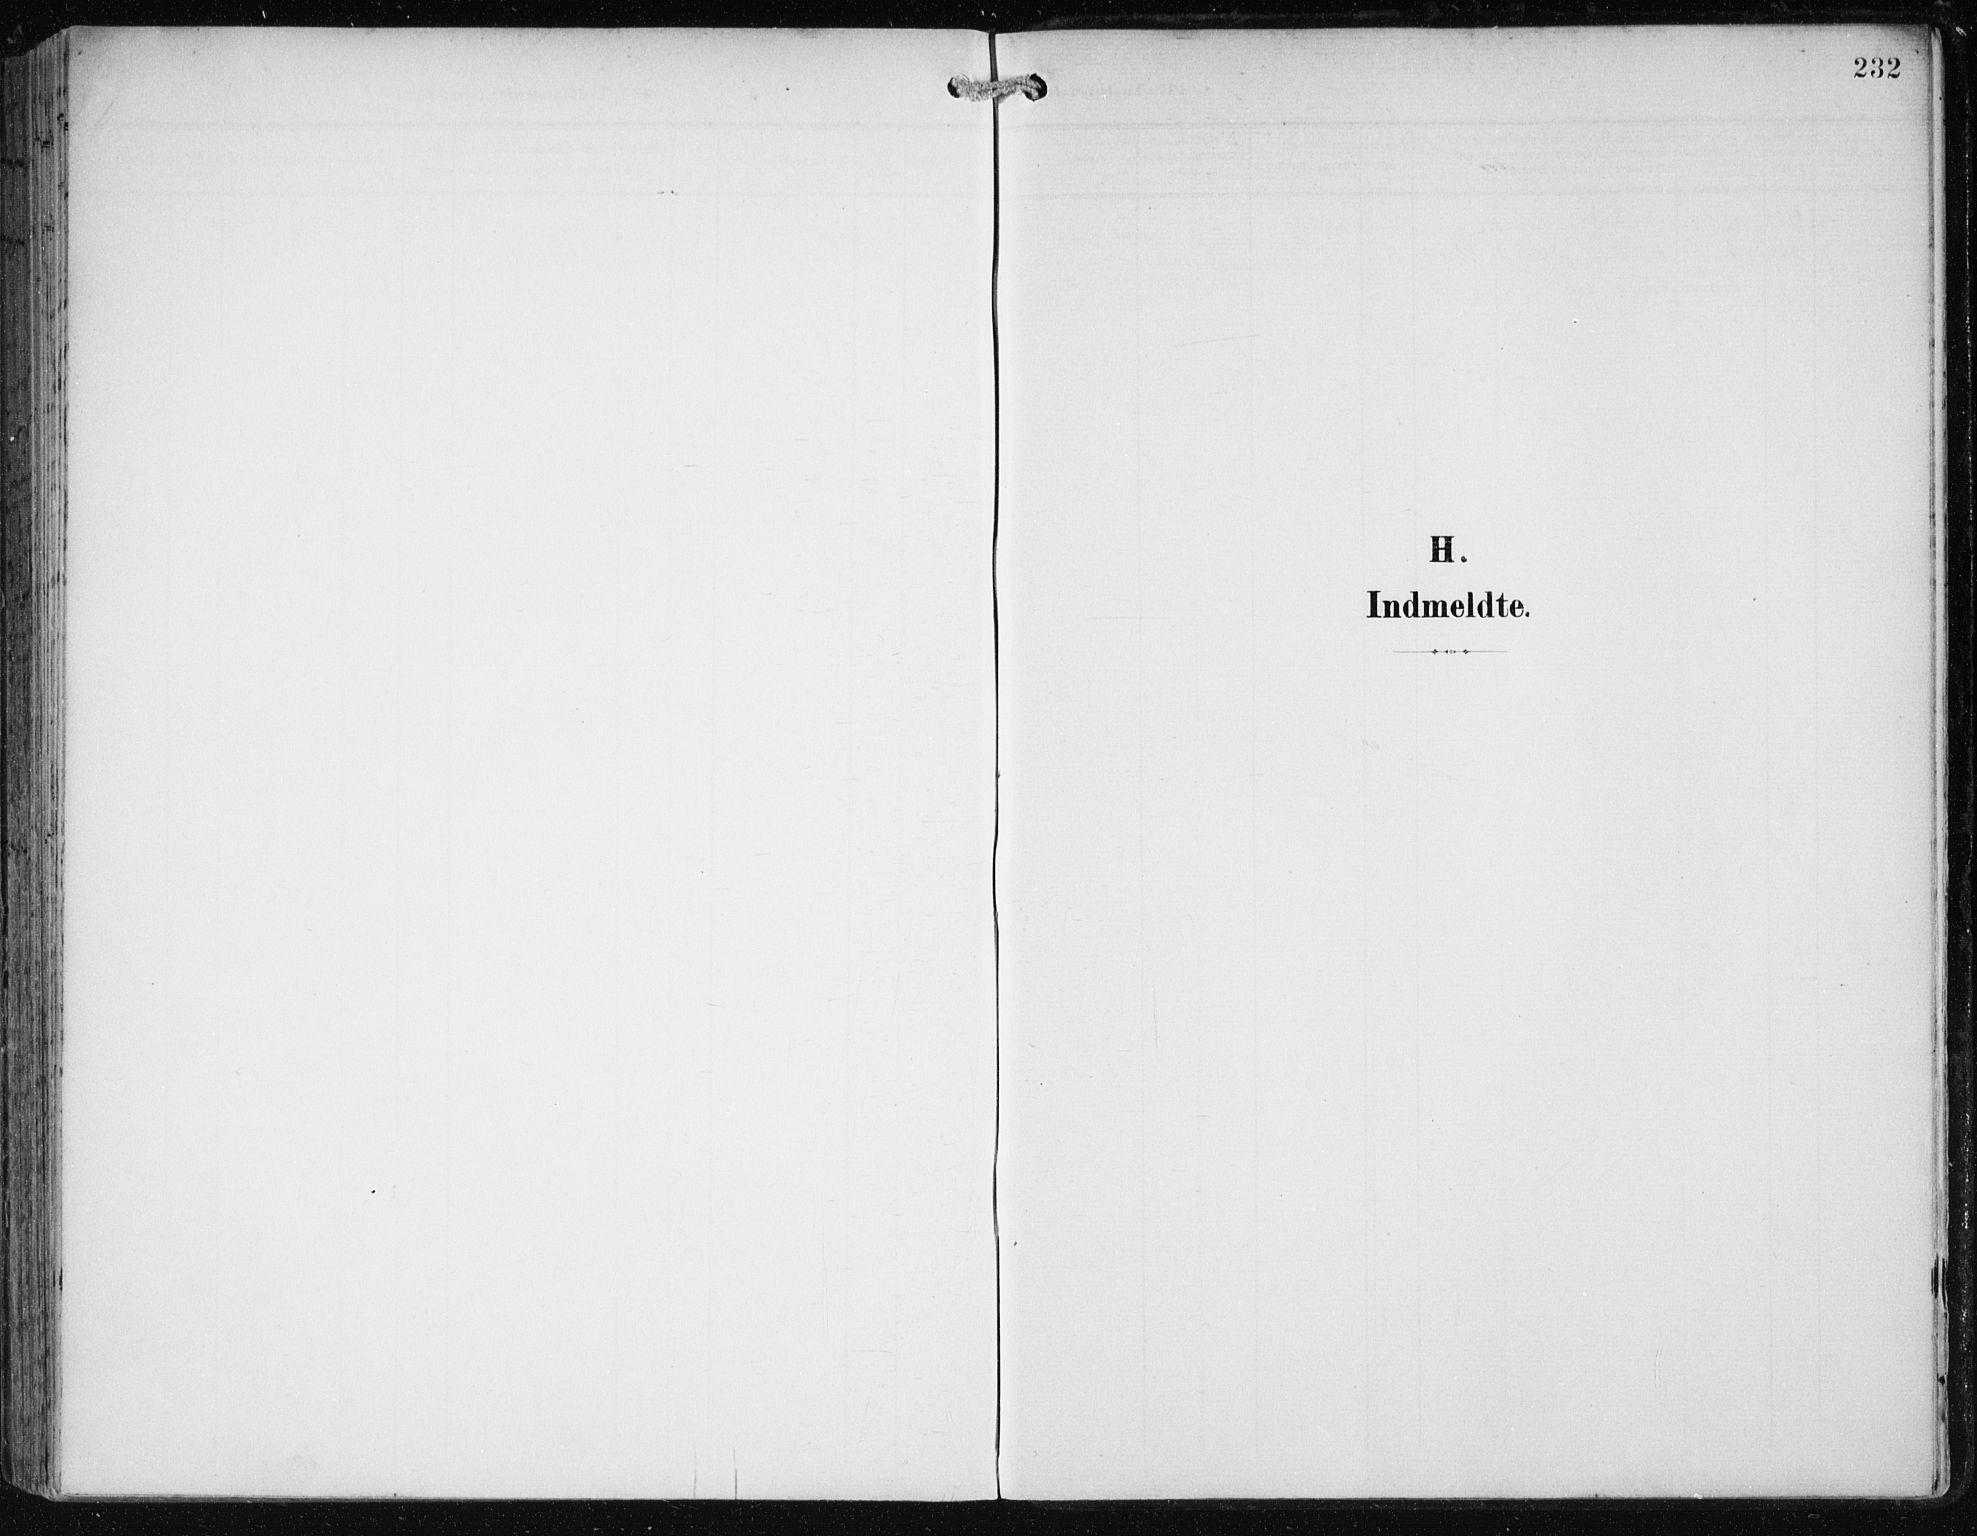 SAB, Fana Sokneprestembete, H/Haa/Haai/L0003: Ministerialbok nr. I 3, 1900-1912, s. 232